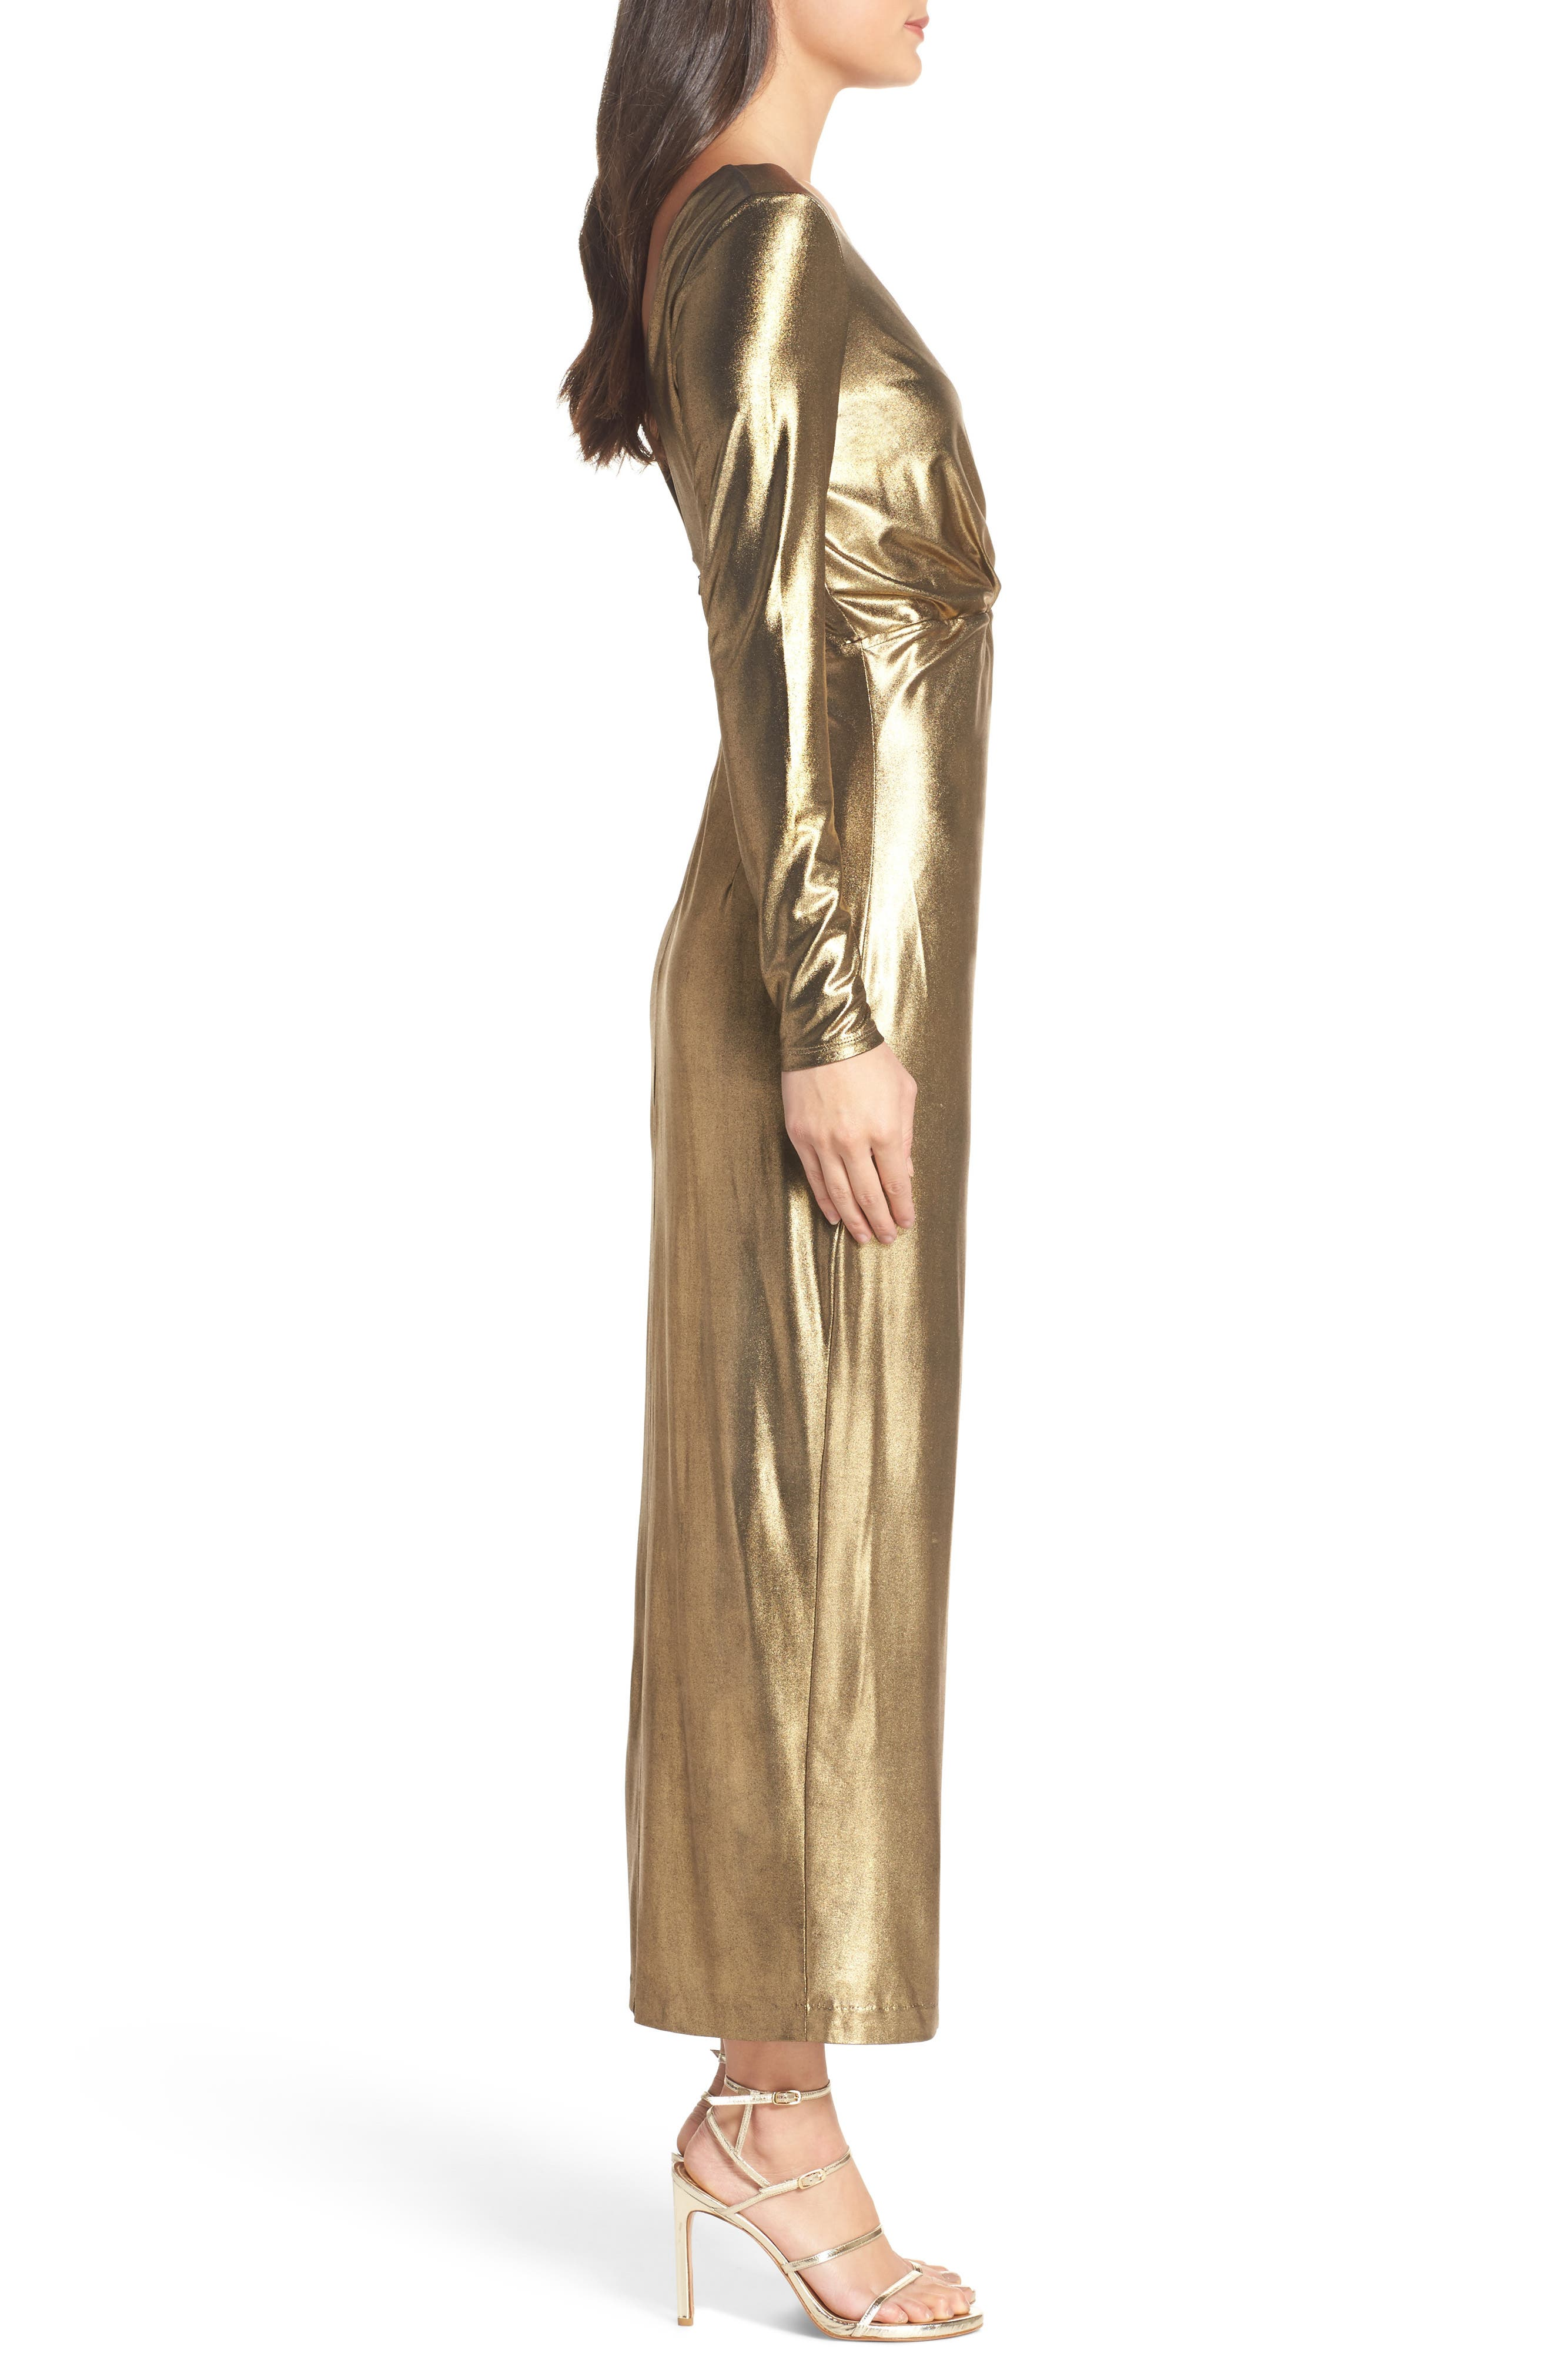 Aurel Metallic Dress,                             Alternate thumbnail 3, color,                             Golden